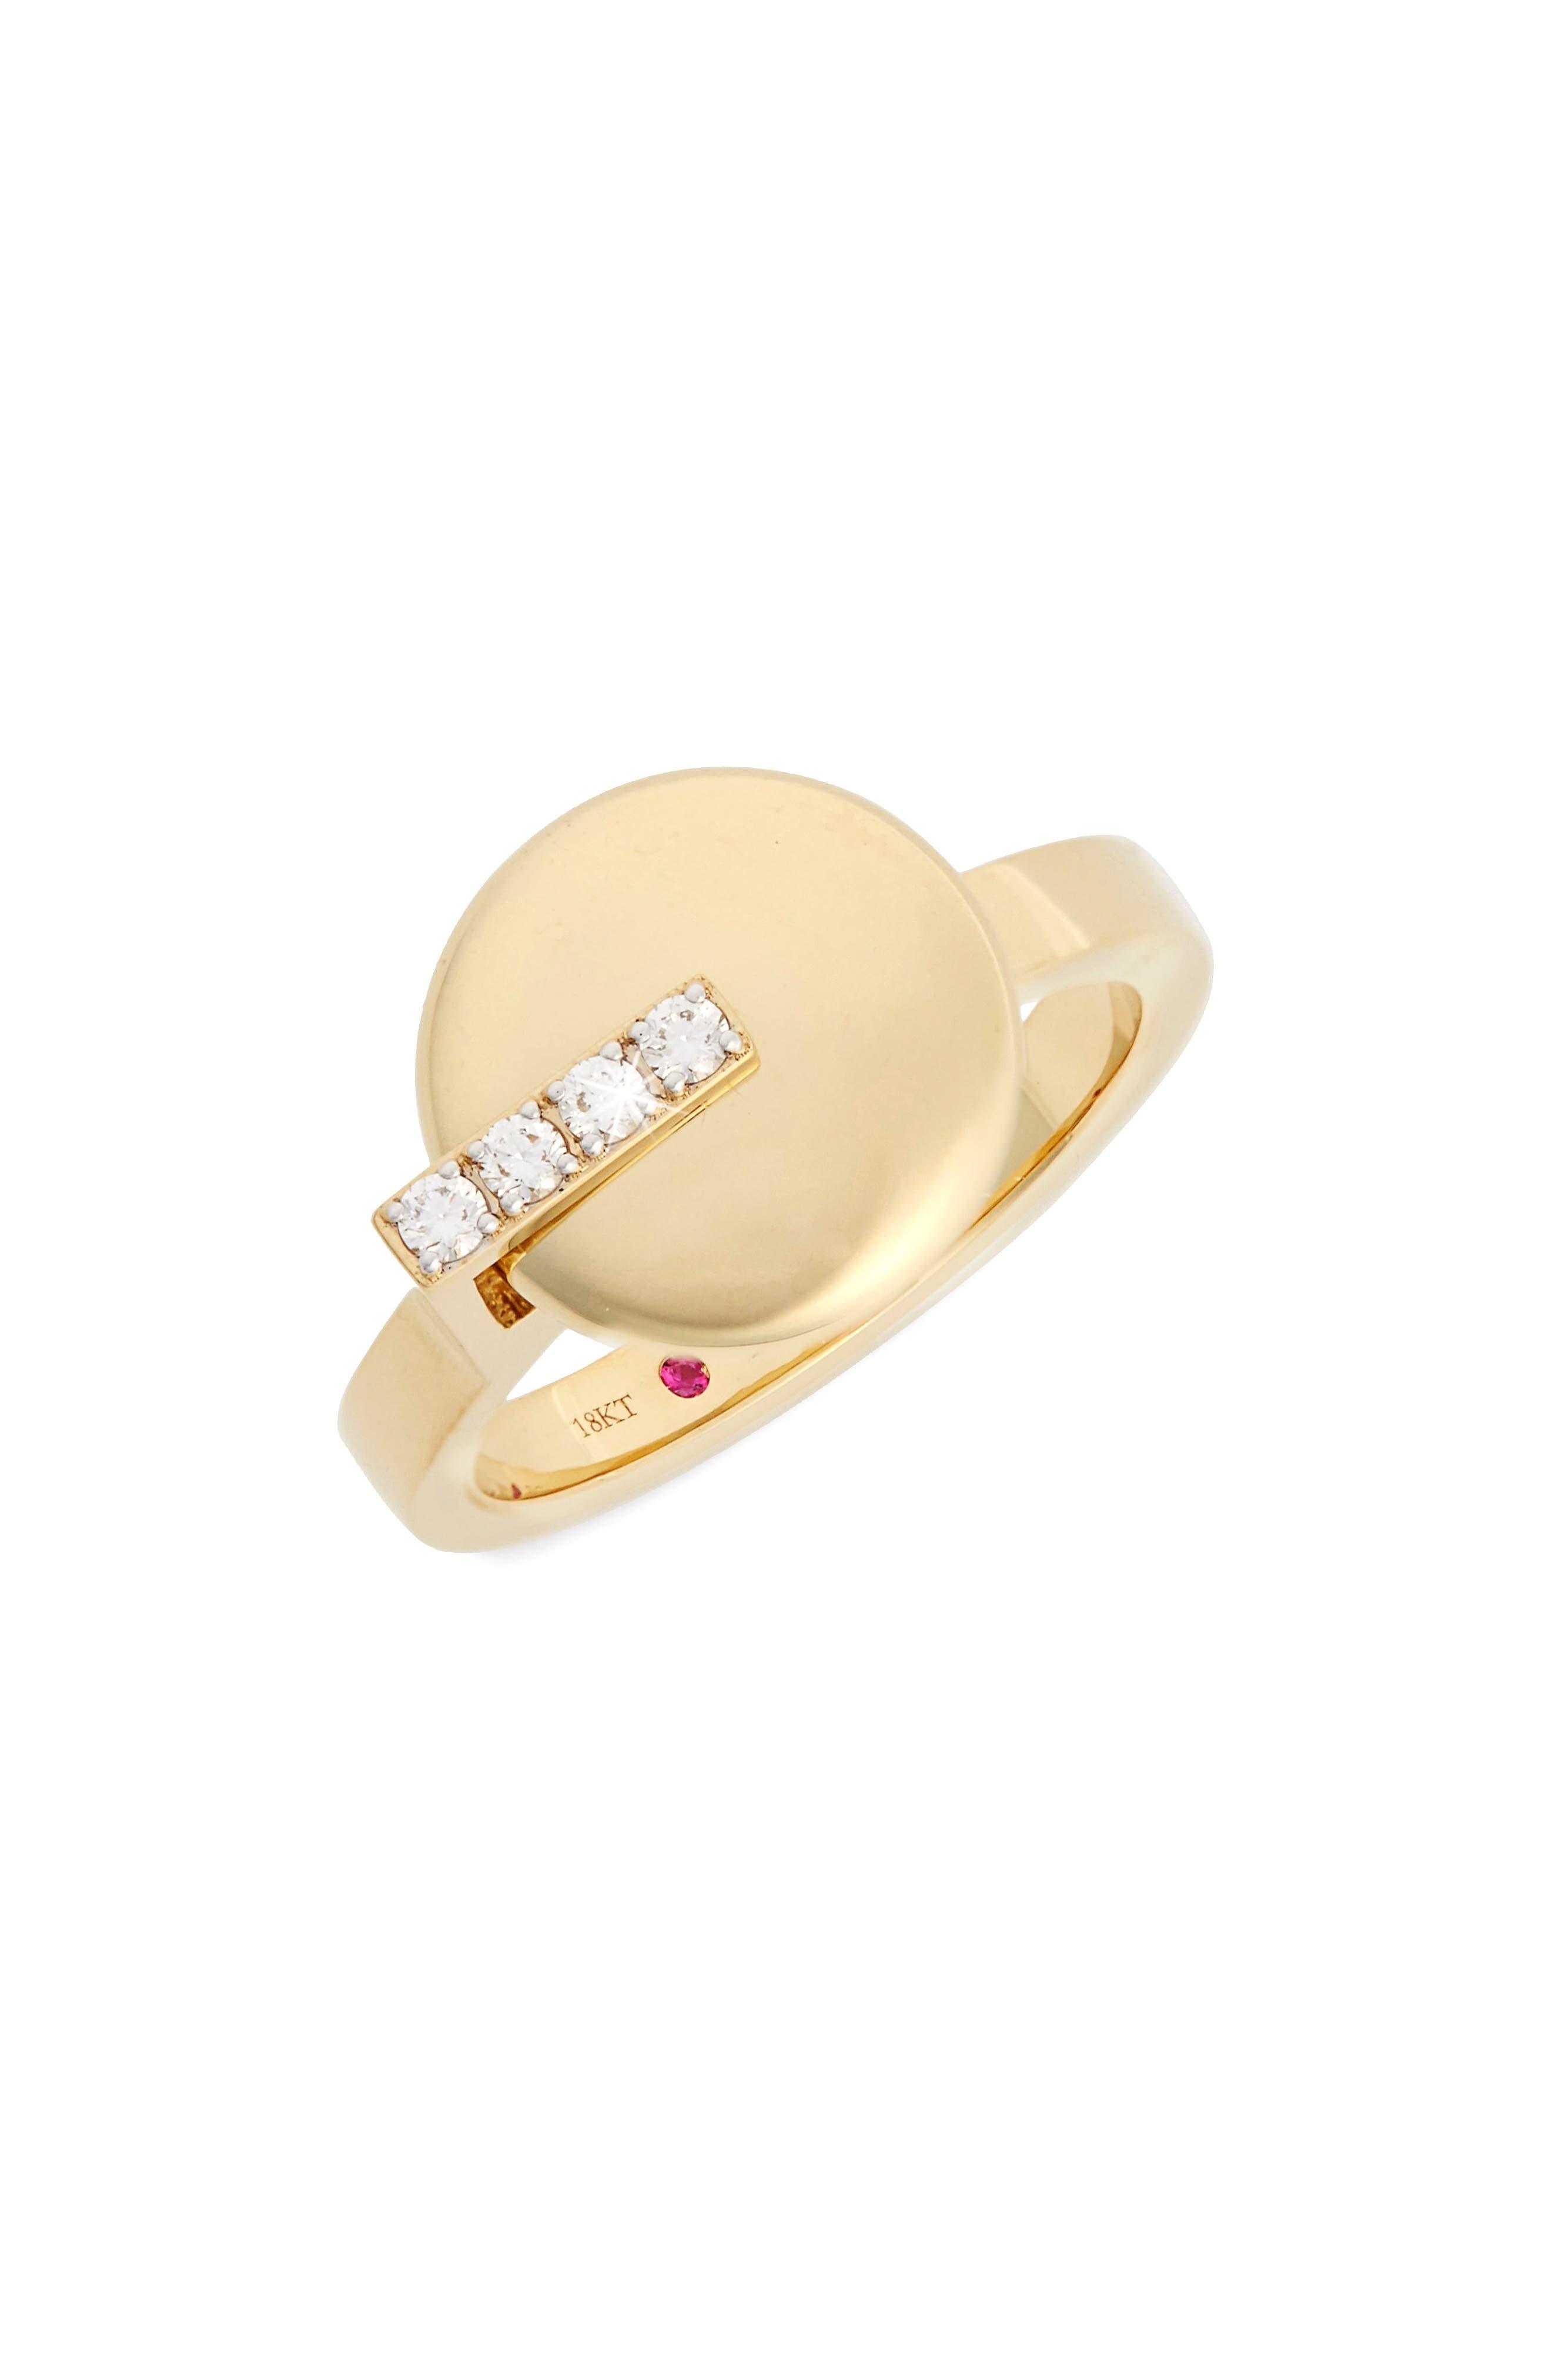 Main Image - Roberto Coin Diamond Ring